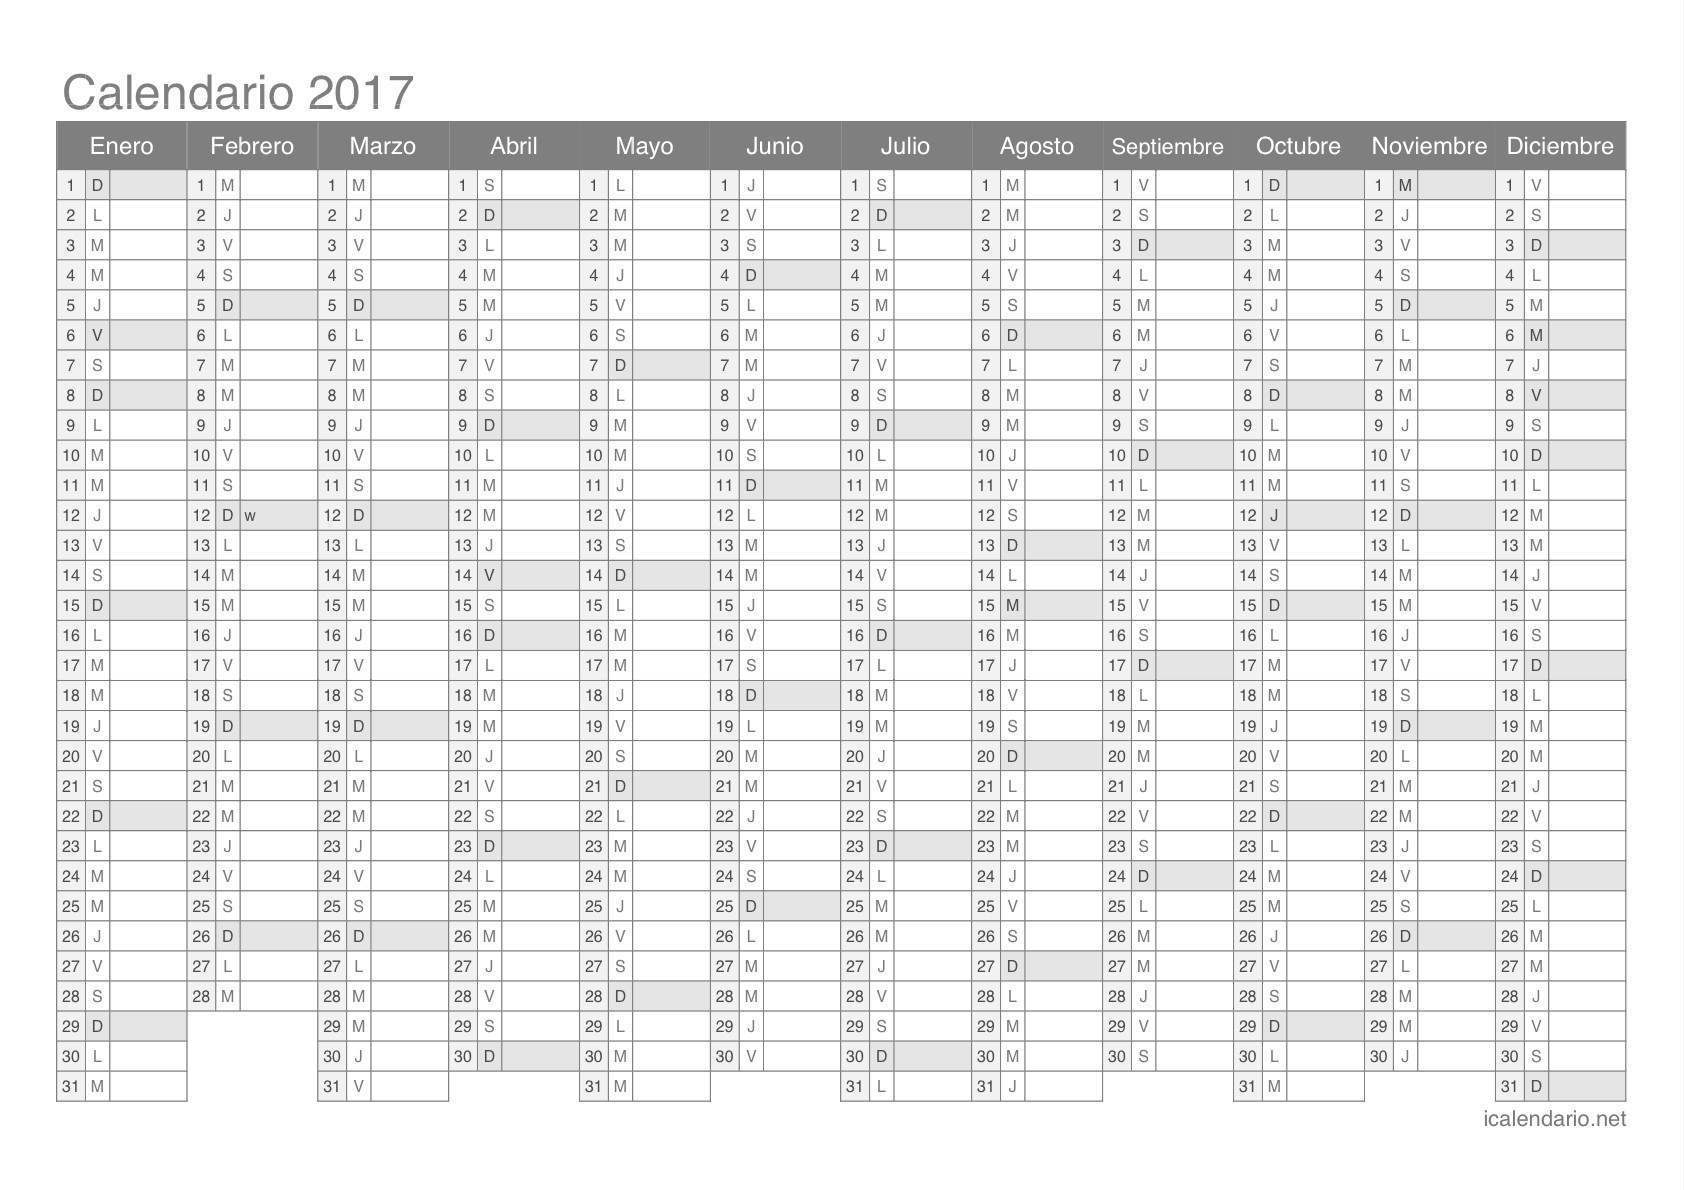 Calendario Para Imprimir Noviembre 2017 Chile Más Actual 2019 2018 Calendar Printable with Holidays List Kalender Kalendar Of Calendario Para Imprimir Noviembre 2017 Chile Más Recientes Imprimir Calendario Cheap Calendario Noviembre Calendario Anual